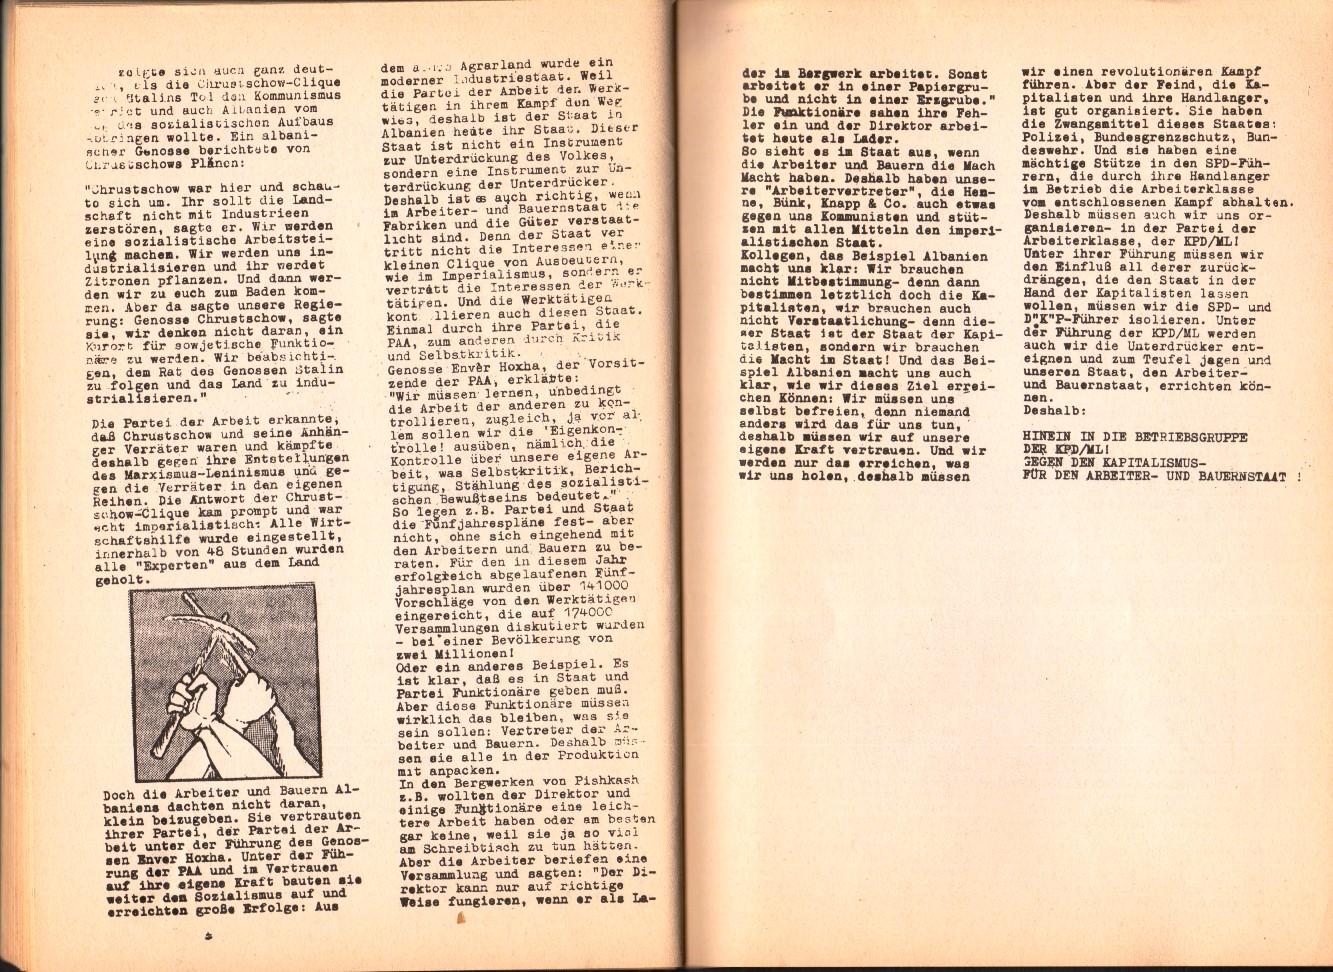 ZB_Parteiarbeiter_1971_10_33